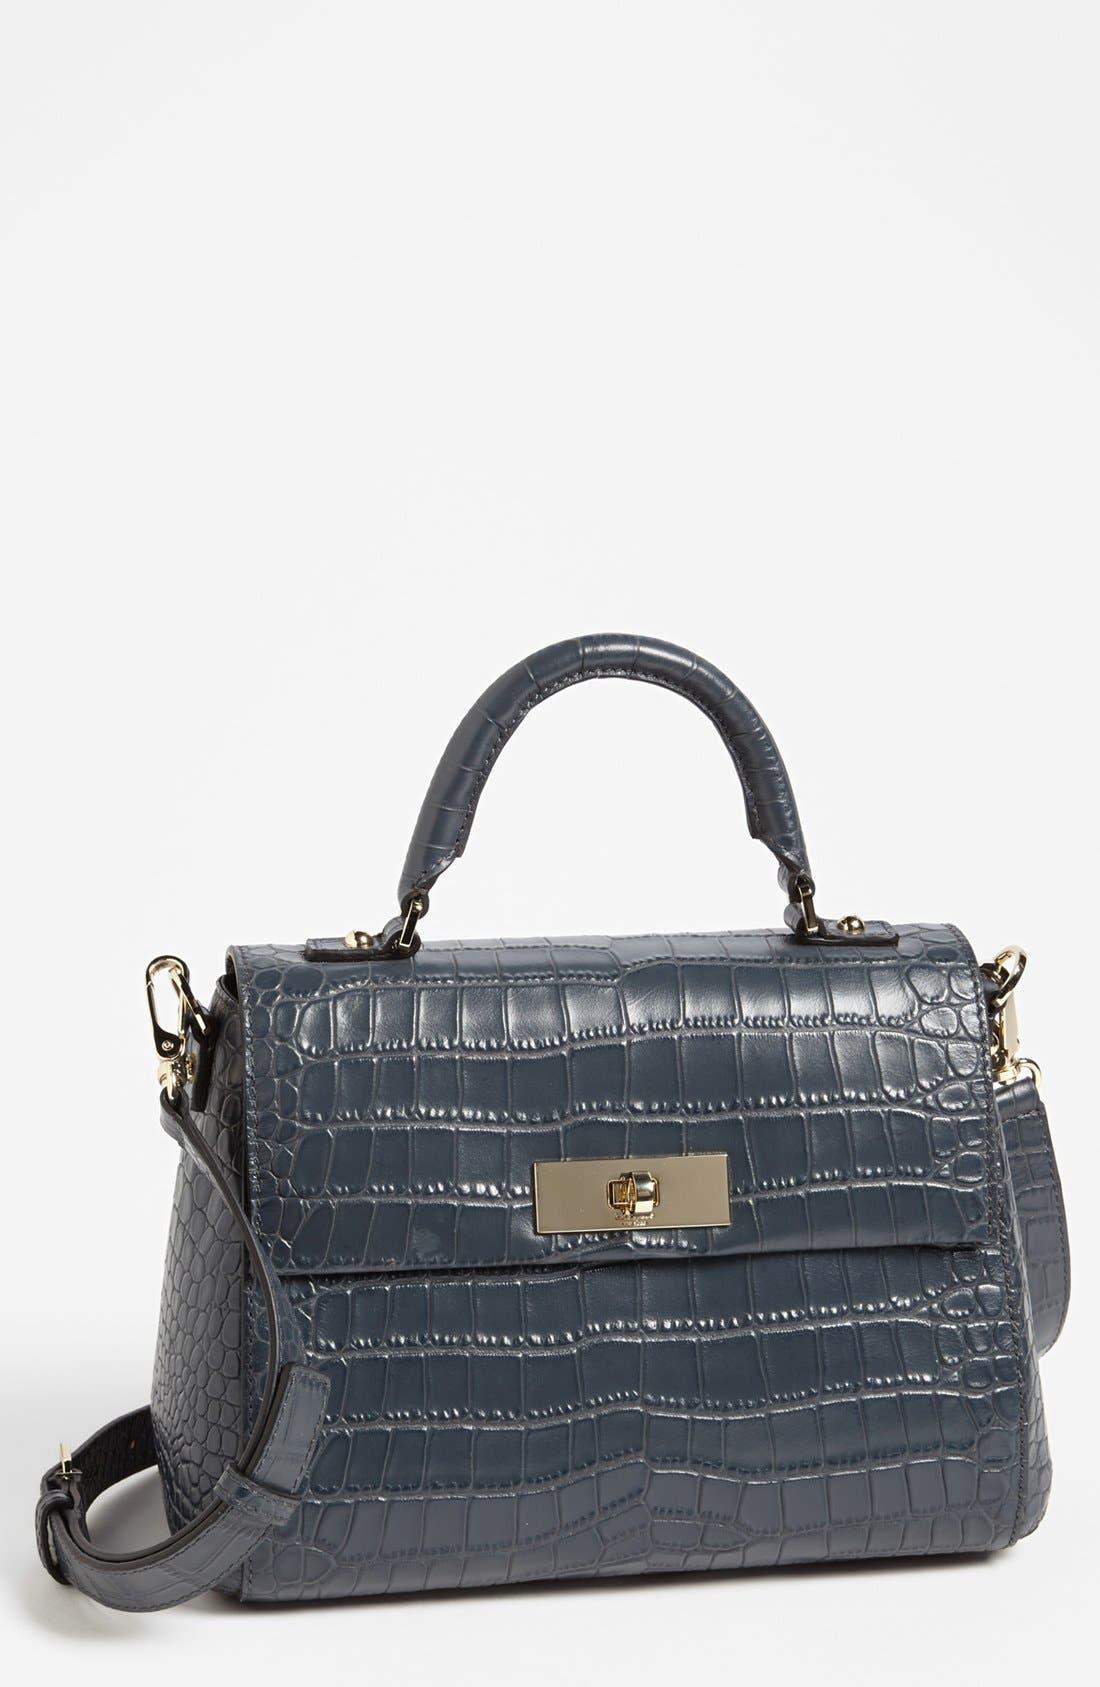 Alternate Image 1 Selected - kate spade new york 'oxford street - nadine' satchel, small